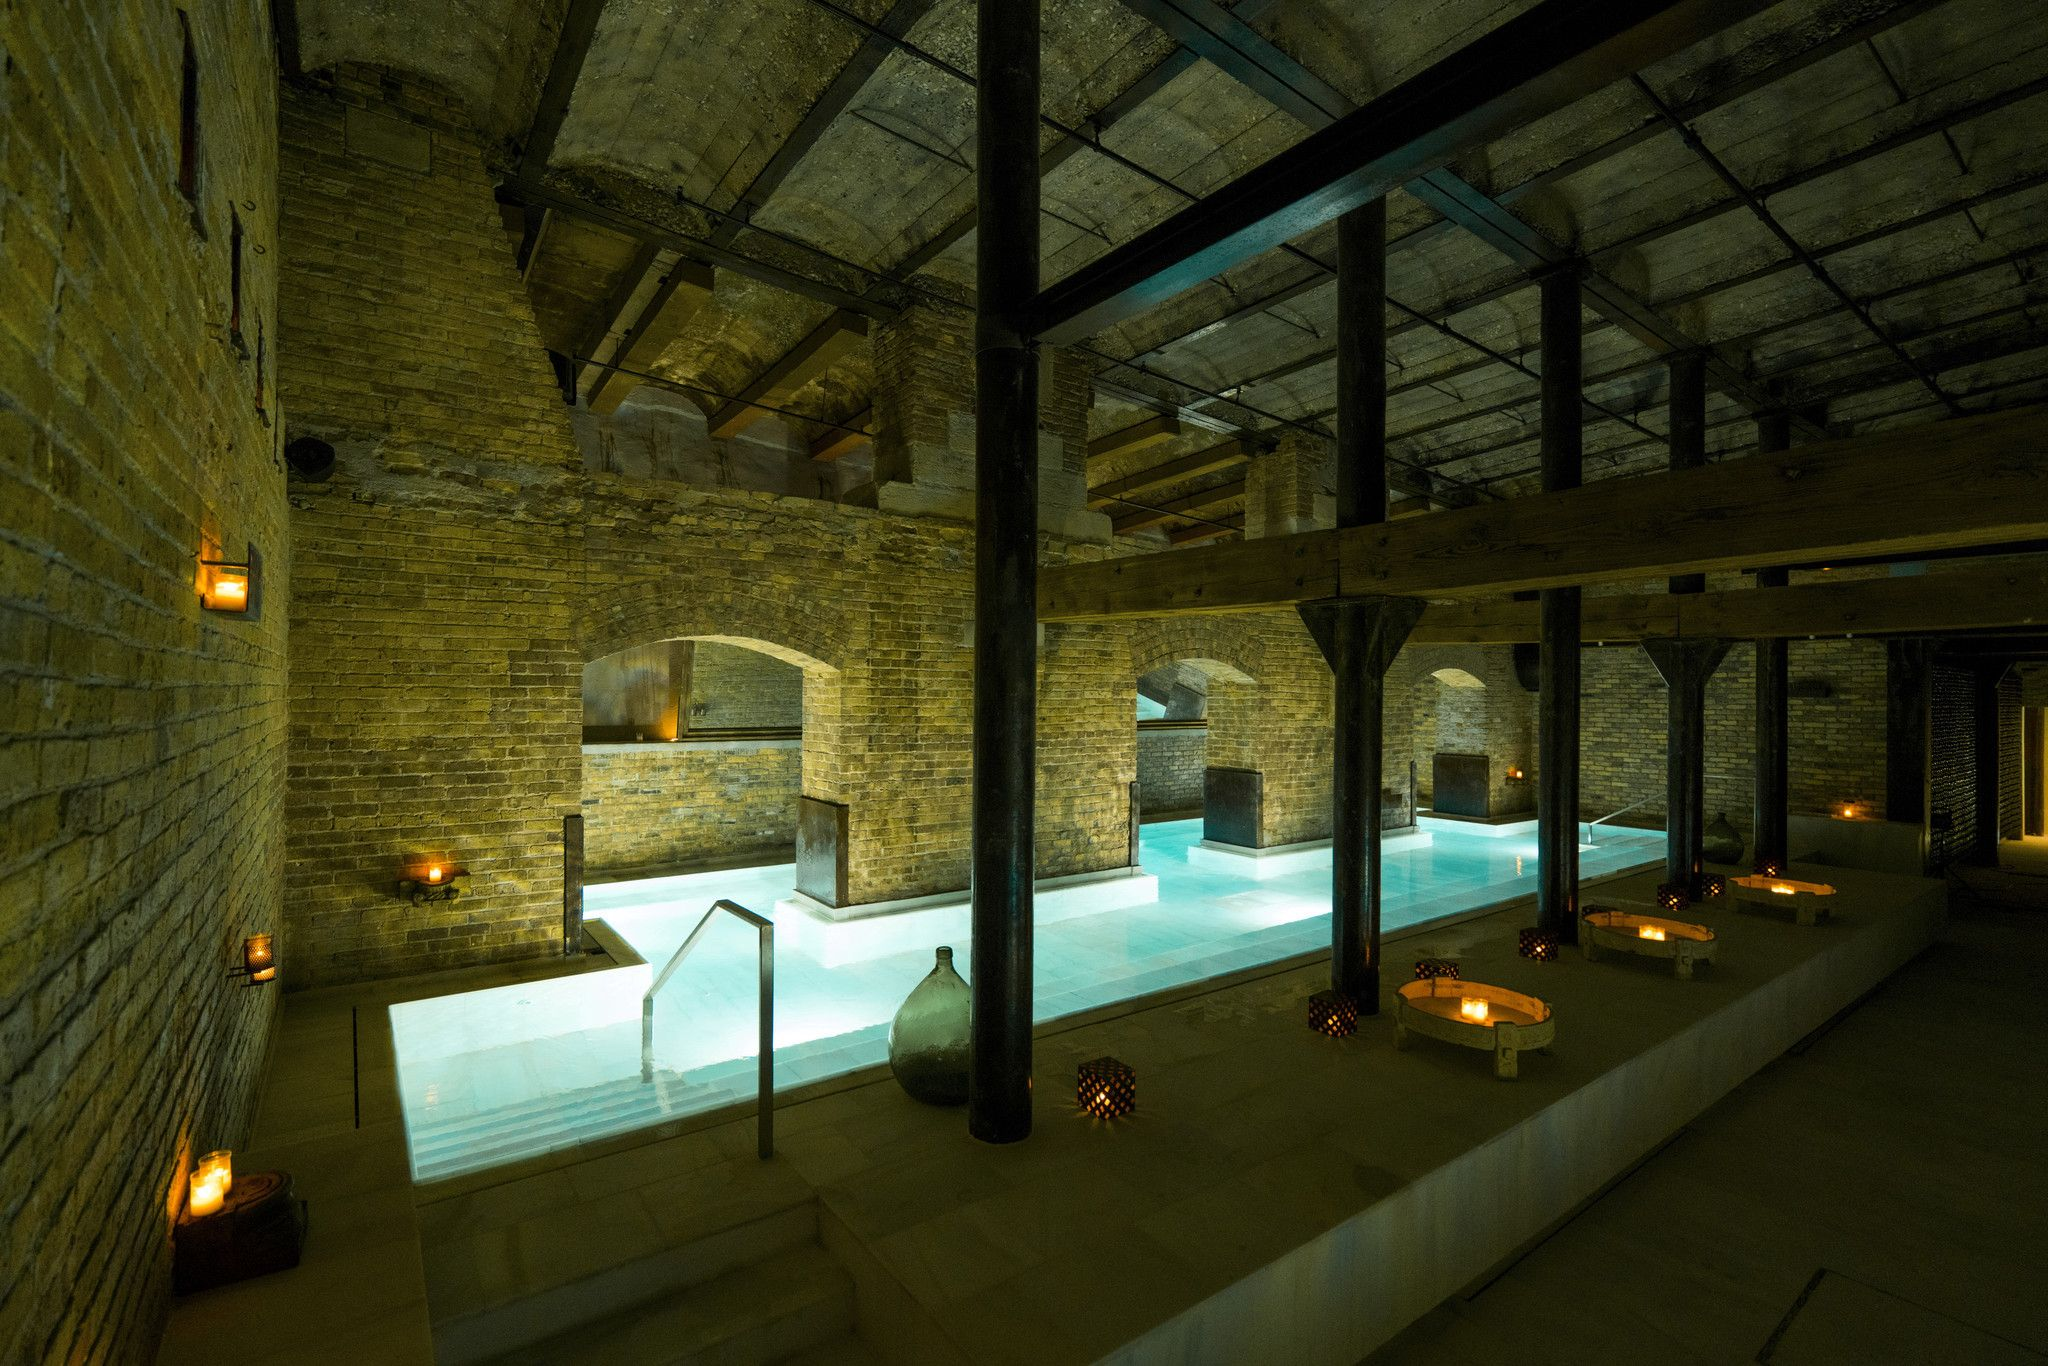 AIRE Ancient Baths Roman bath house, Bath house, Roman baths